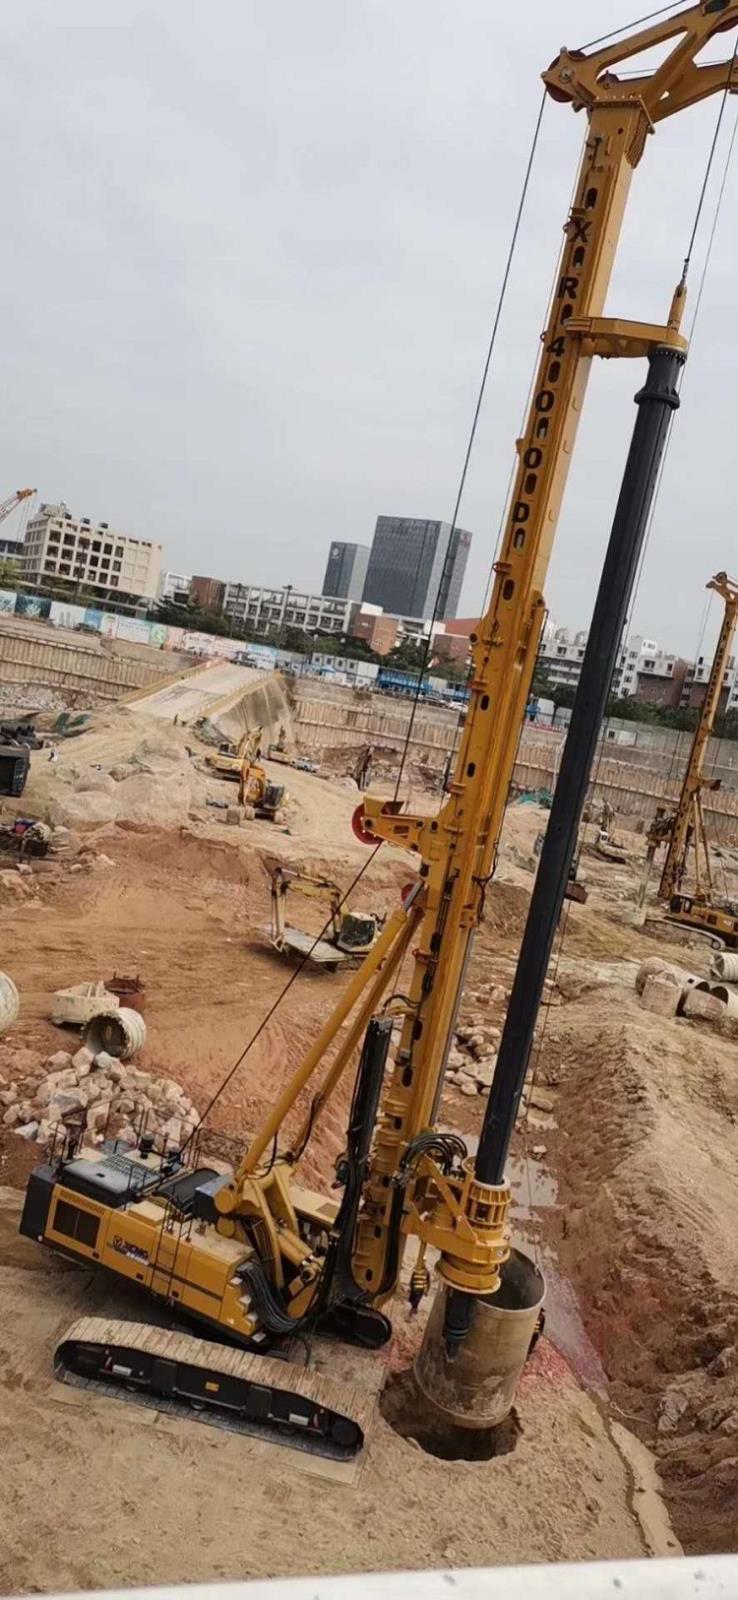 亿欧JS575-4*20M首页bob配套徐工XR400D钻机在广东工地施工